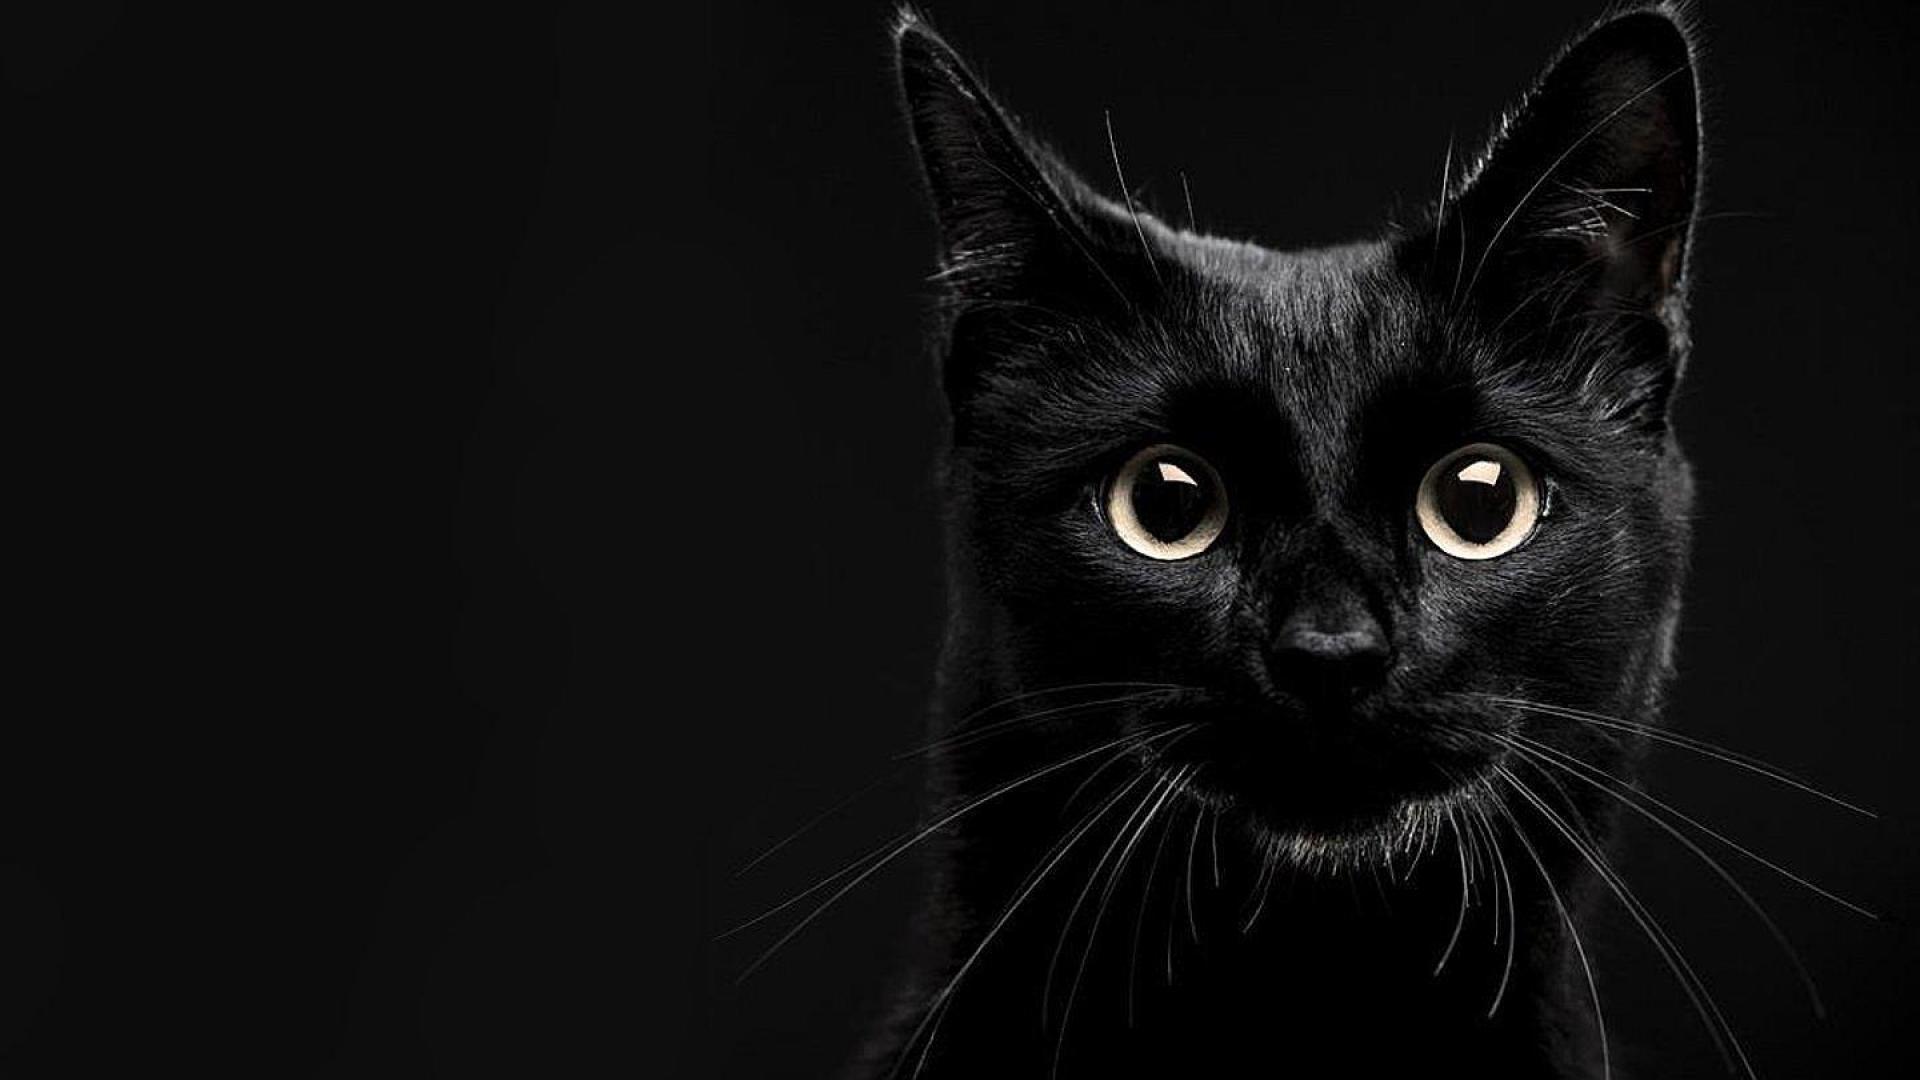 Cool Black Cat Image In 4k Ultra Hd